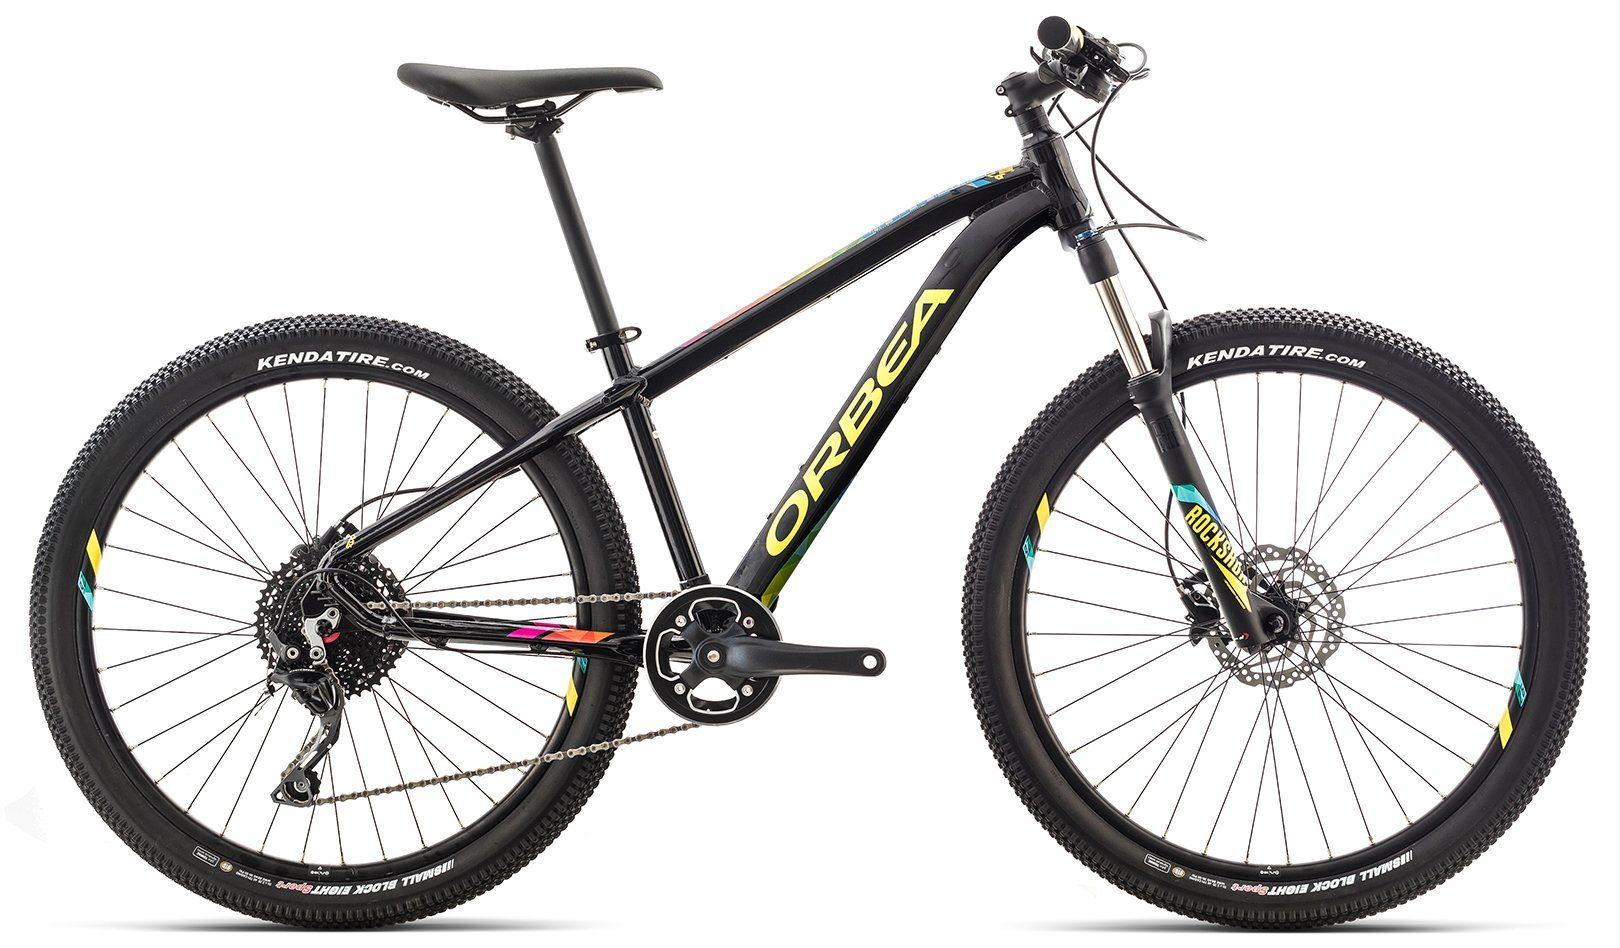 ORBEA Hardtail Mountainbike, 26 Zoll, 10 Gang Shimano Deore Kettenschaltung, »MX 26 Trail«